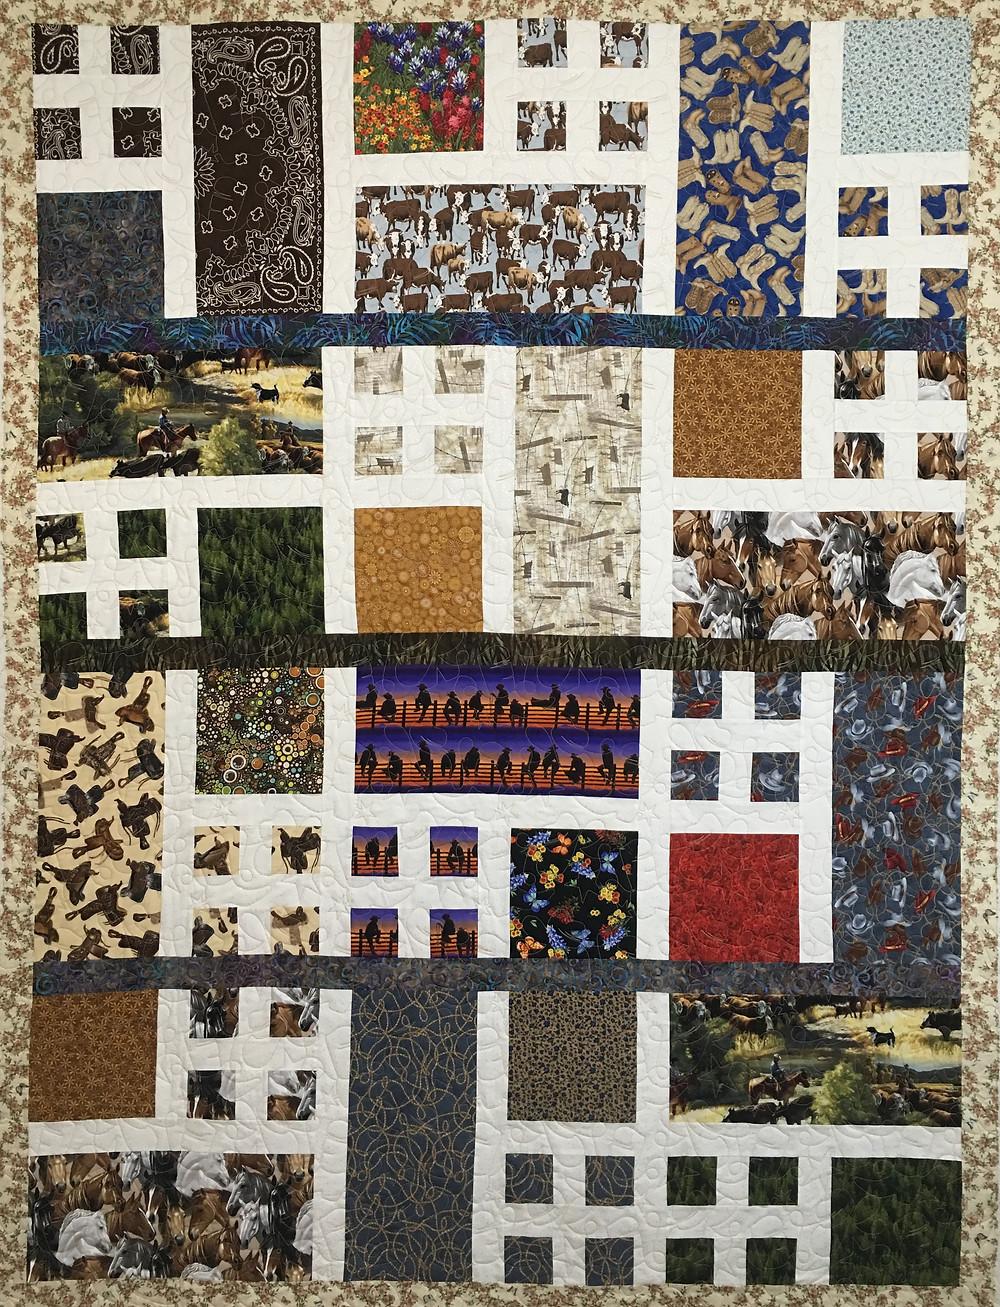 Western Theme Quilt made by Kristi Jones